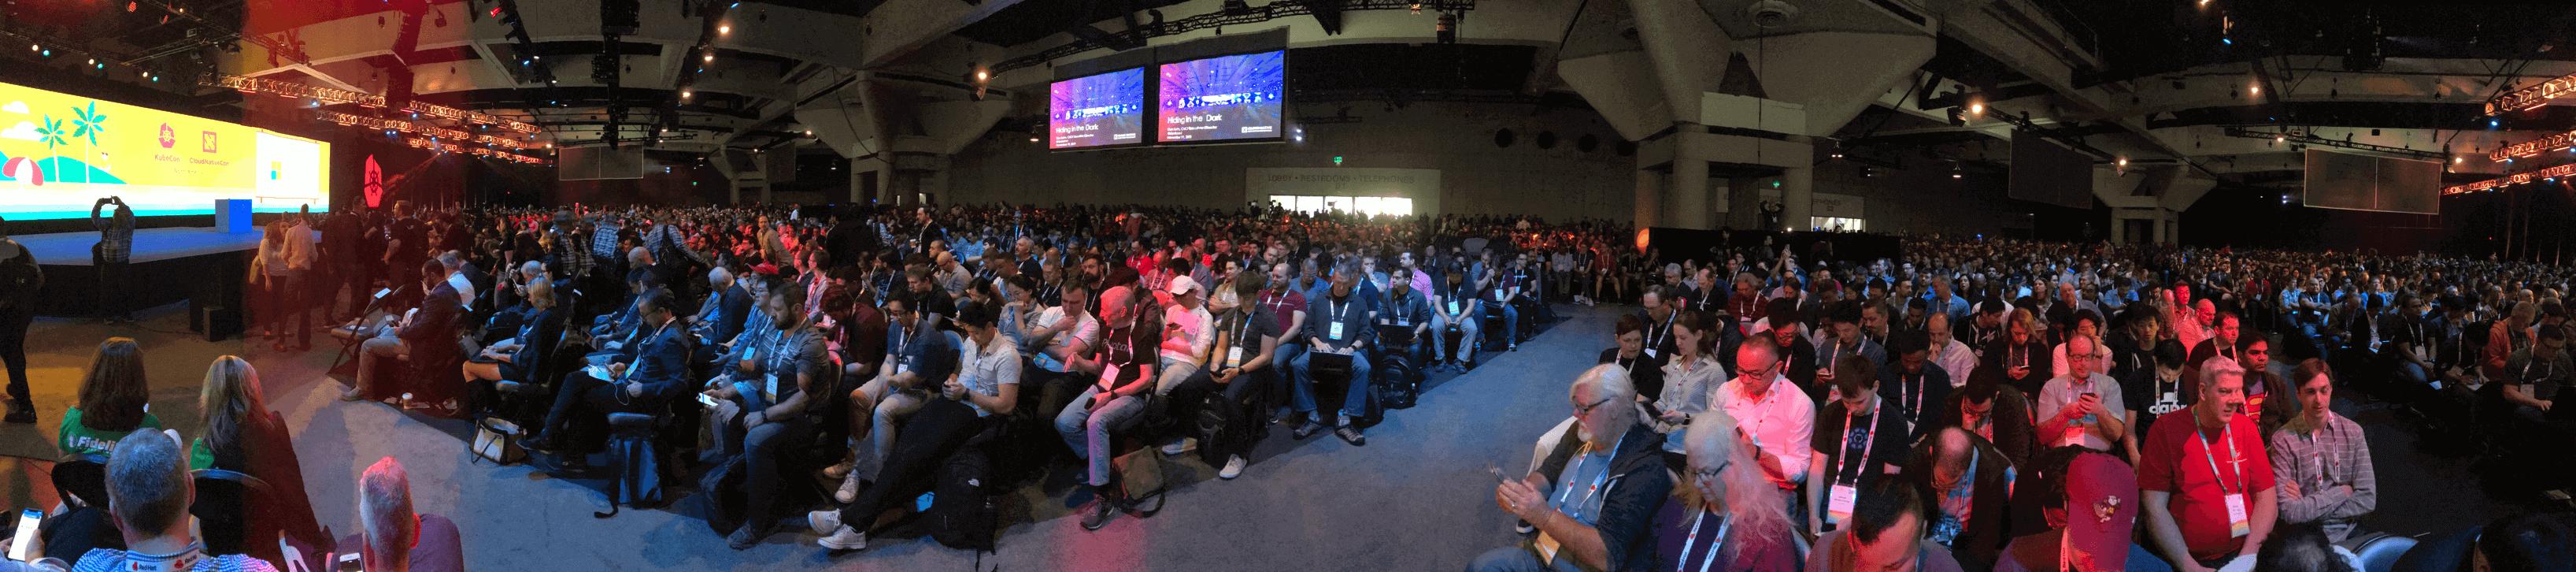 KubeCon 2019